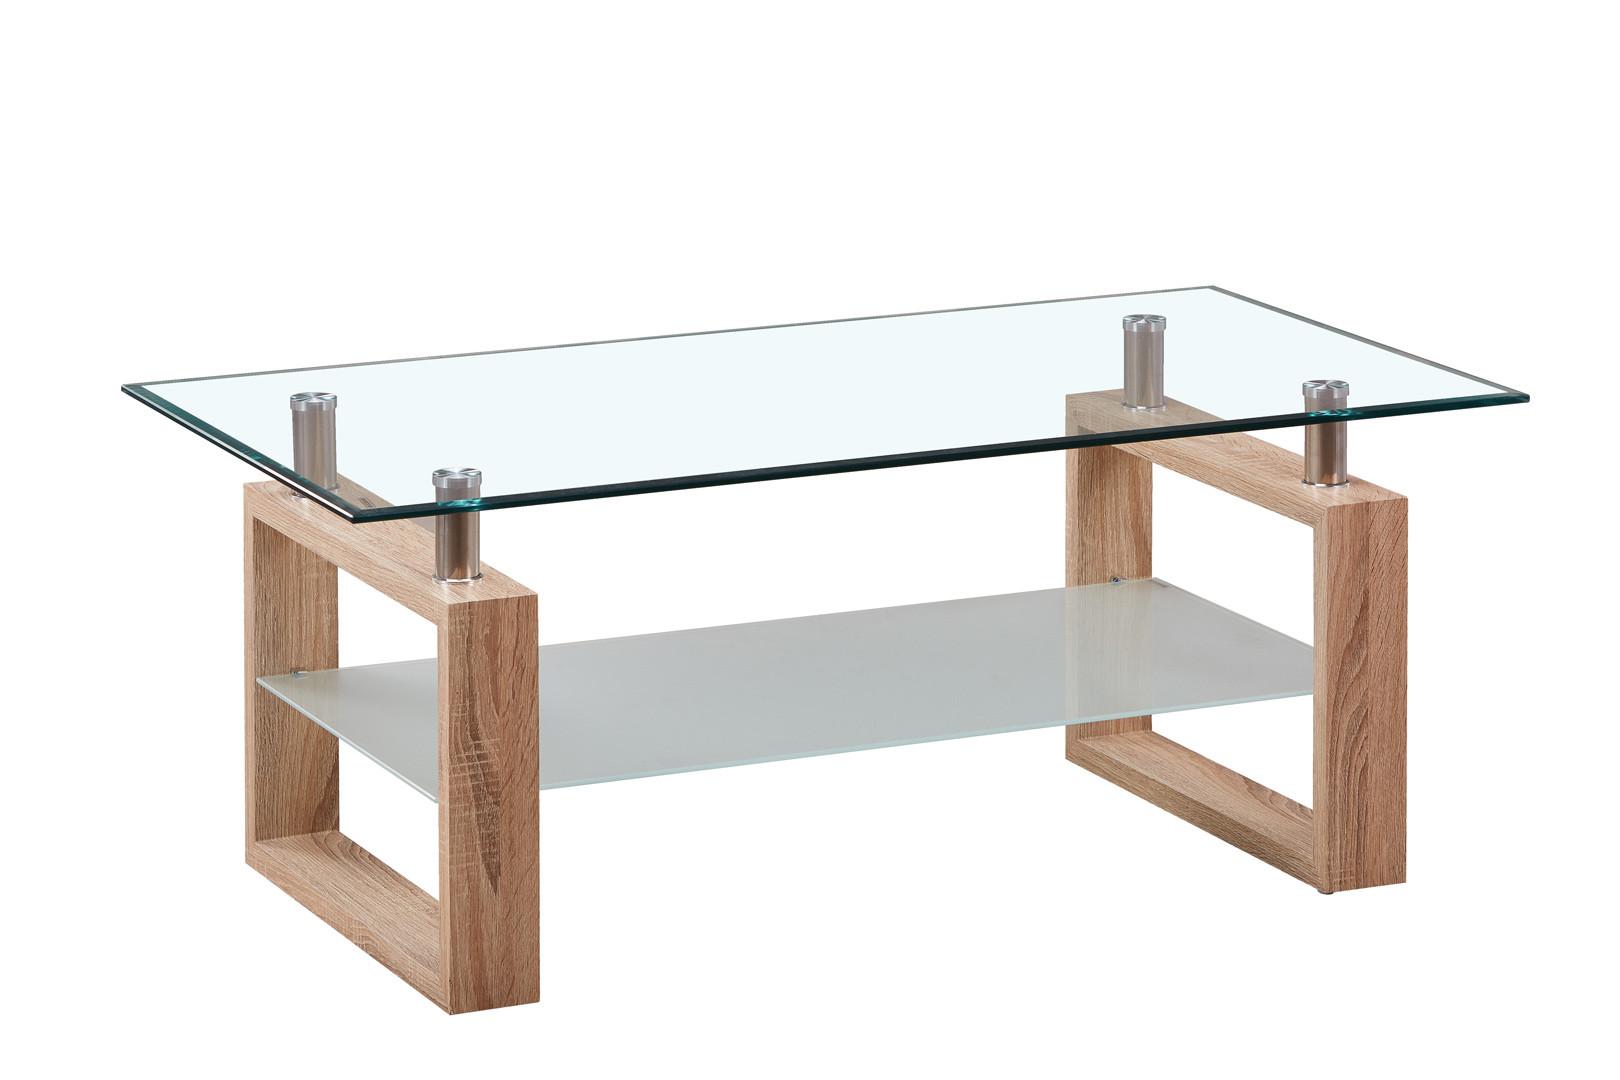 table basse design verre et bois coloris chene andora